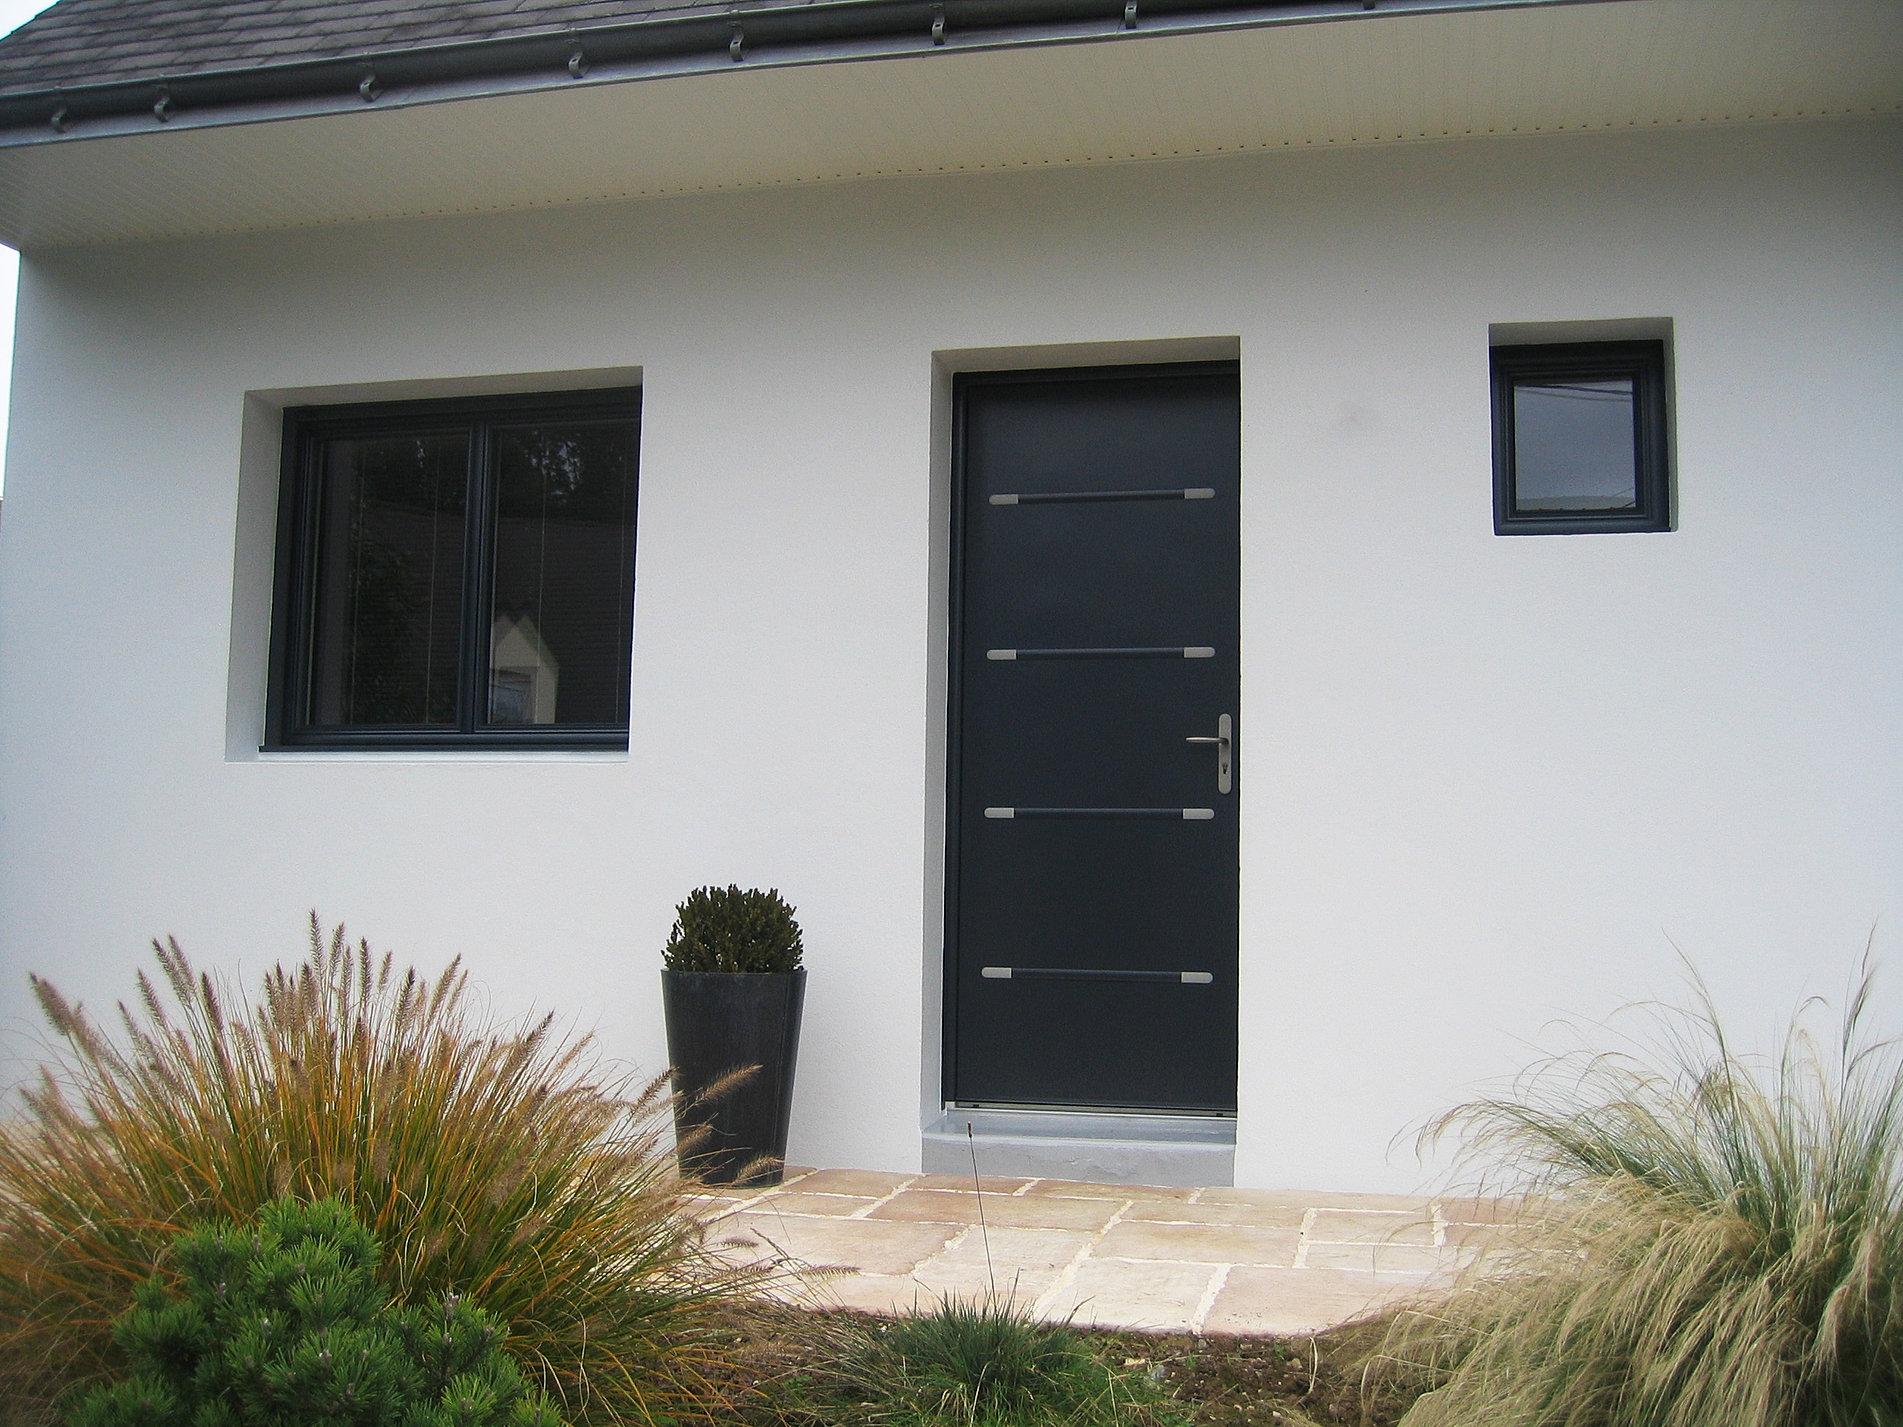 Fybolia fabricant fenetres portes portails for Fabricant porte fenetre